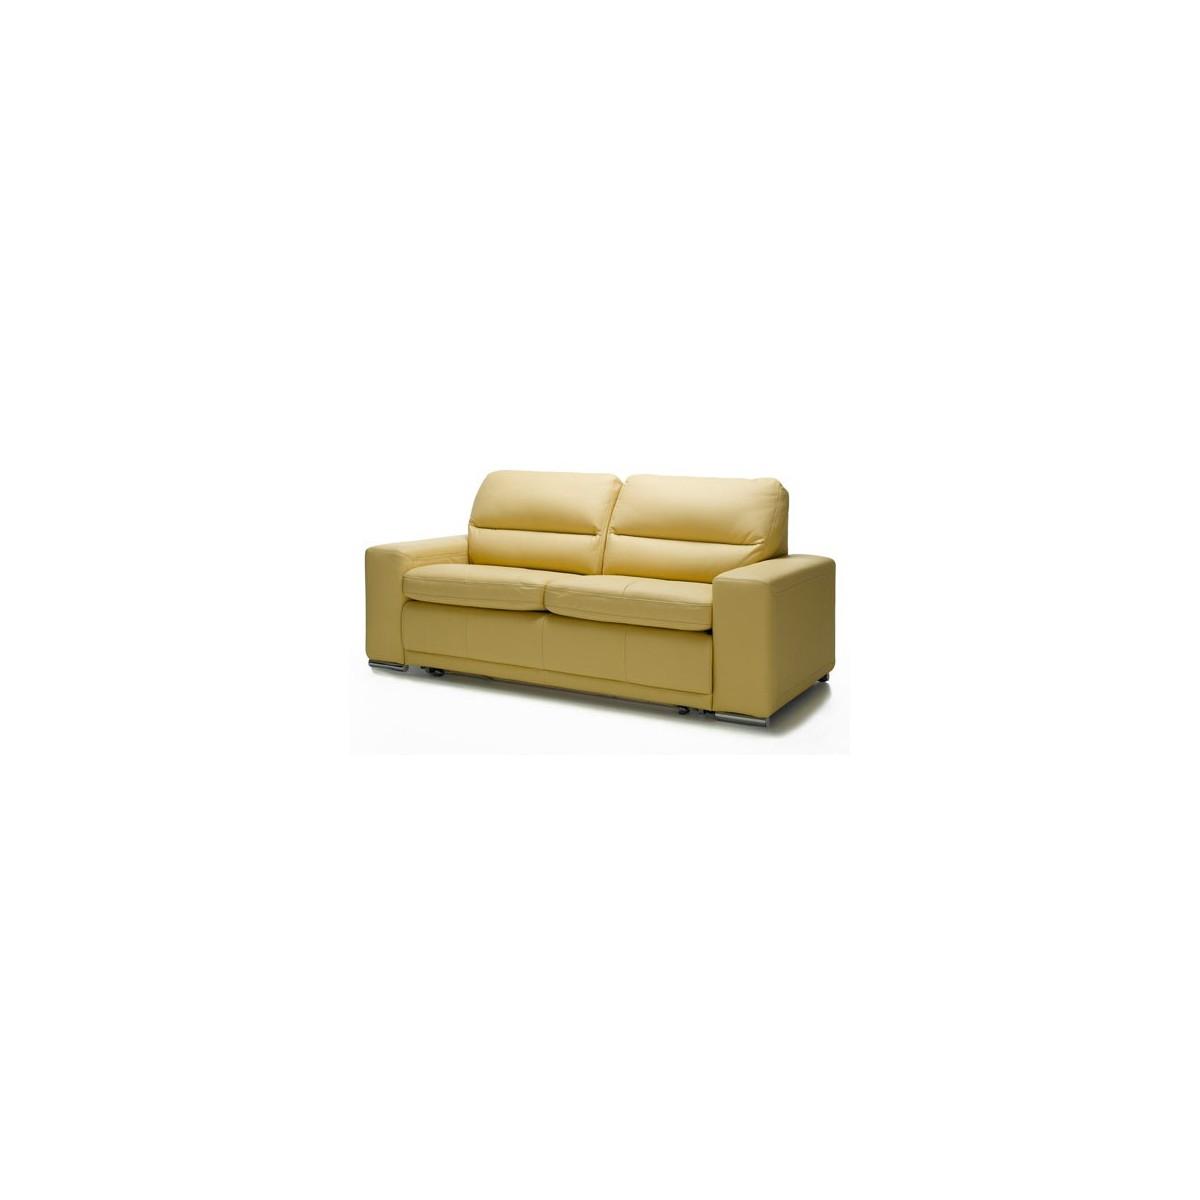 Bono Sofa 3F 189cm z funkcją spania